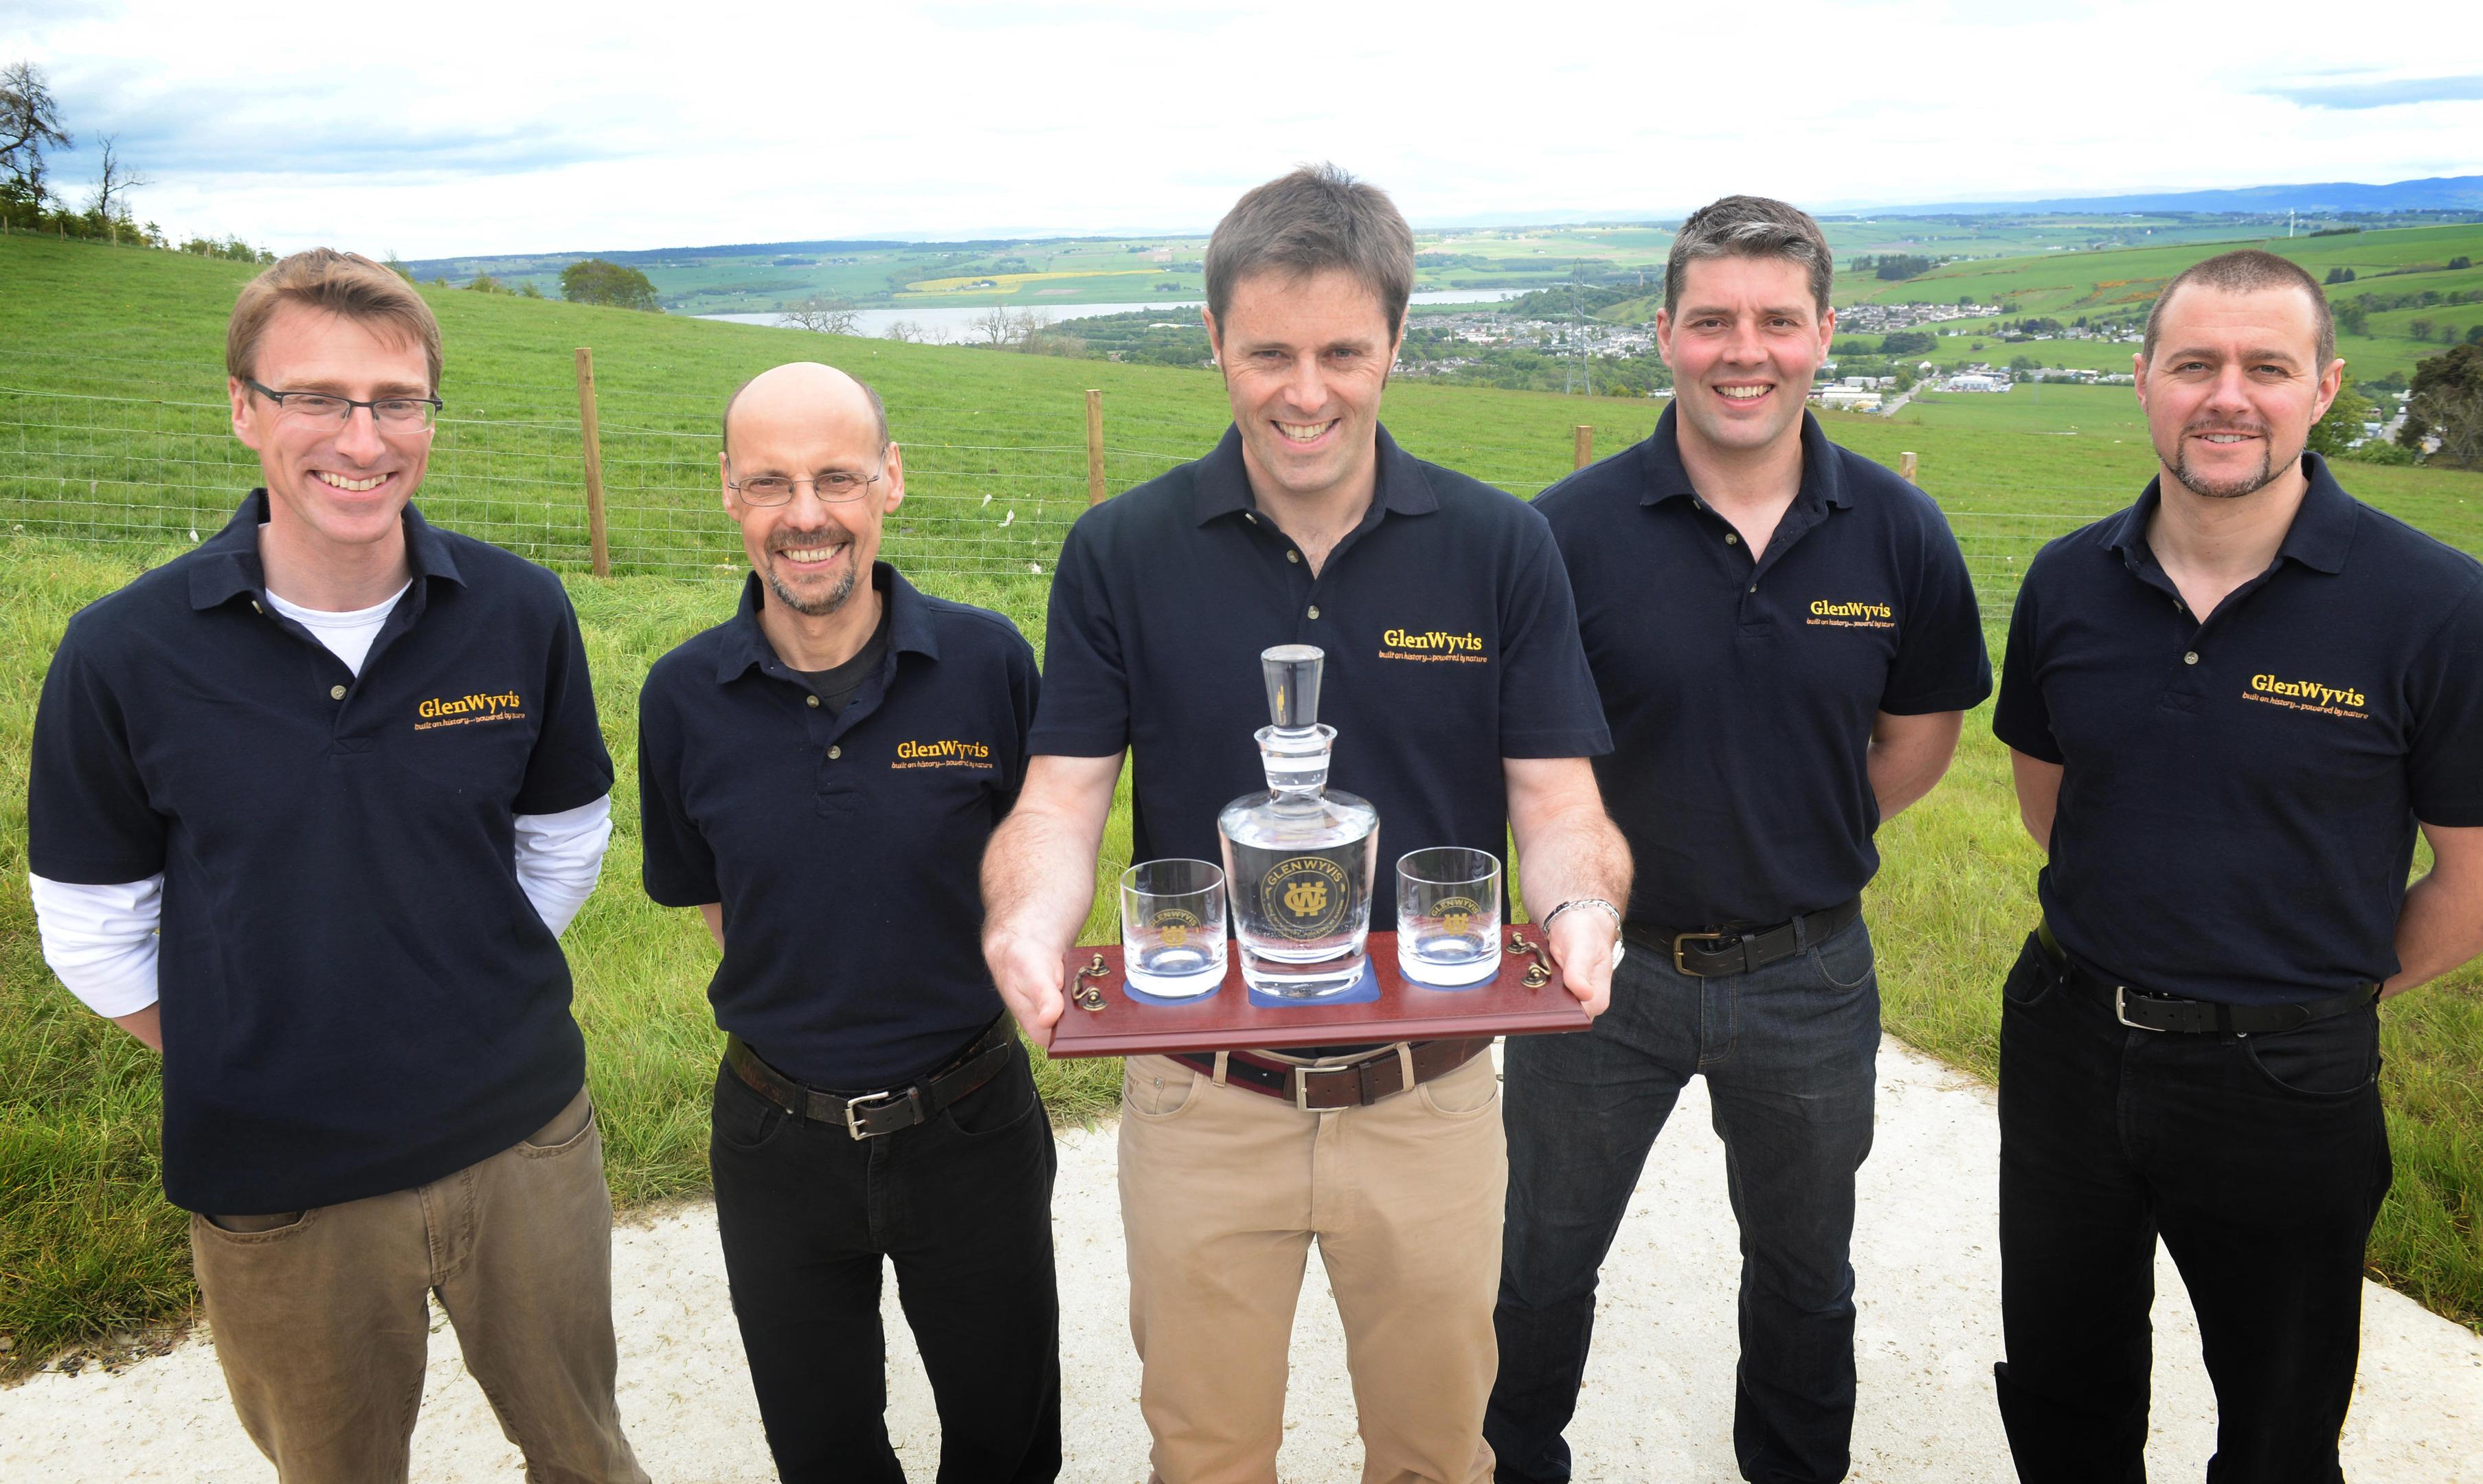 GlenWyvis Community Distillery directors: Left to right: Richard Lockett, Stuart Nickerson, John Fraser McKenzie, James Cameron, William Reynolds